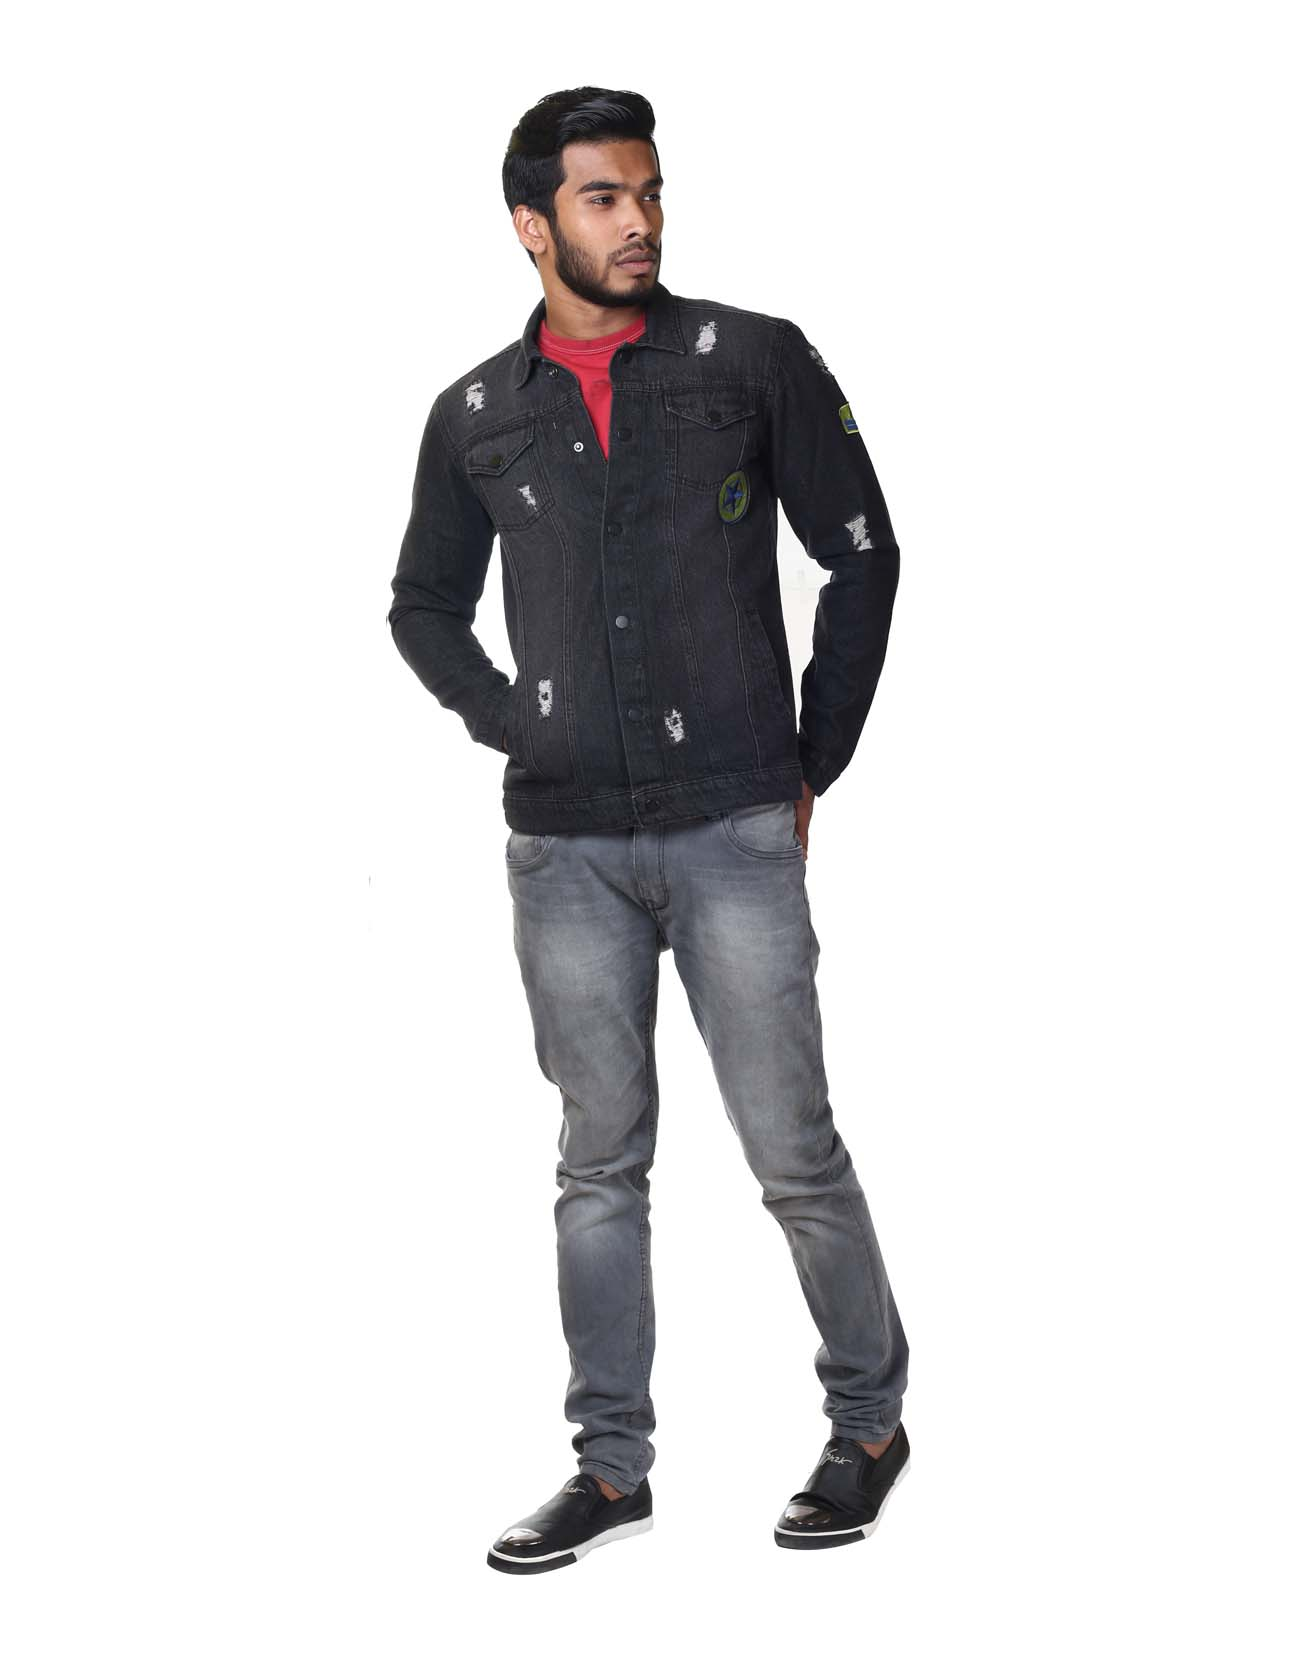 Distressed Denim Patch Jacket